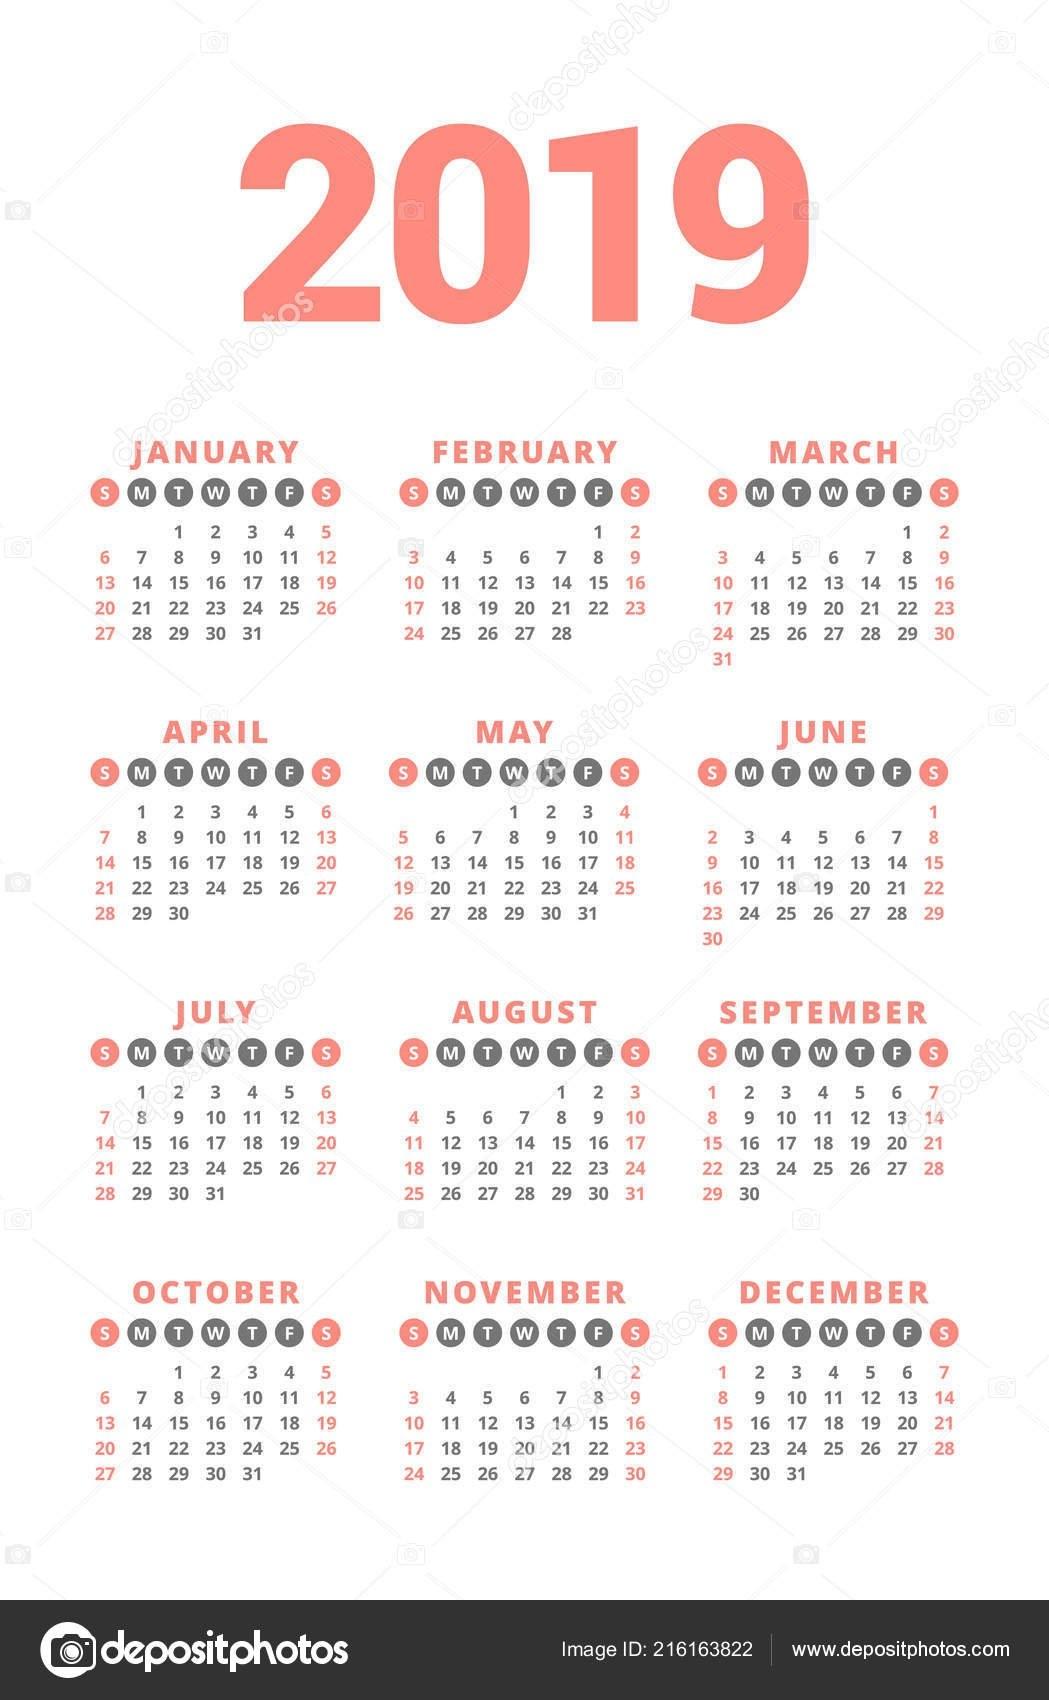 Calendar 2019 Year White Background Week Starts Sunday Columns Rows 4 Column Calendar 2019